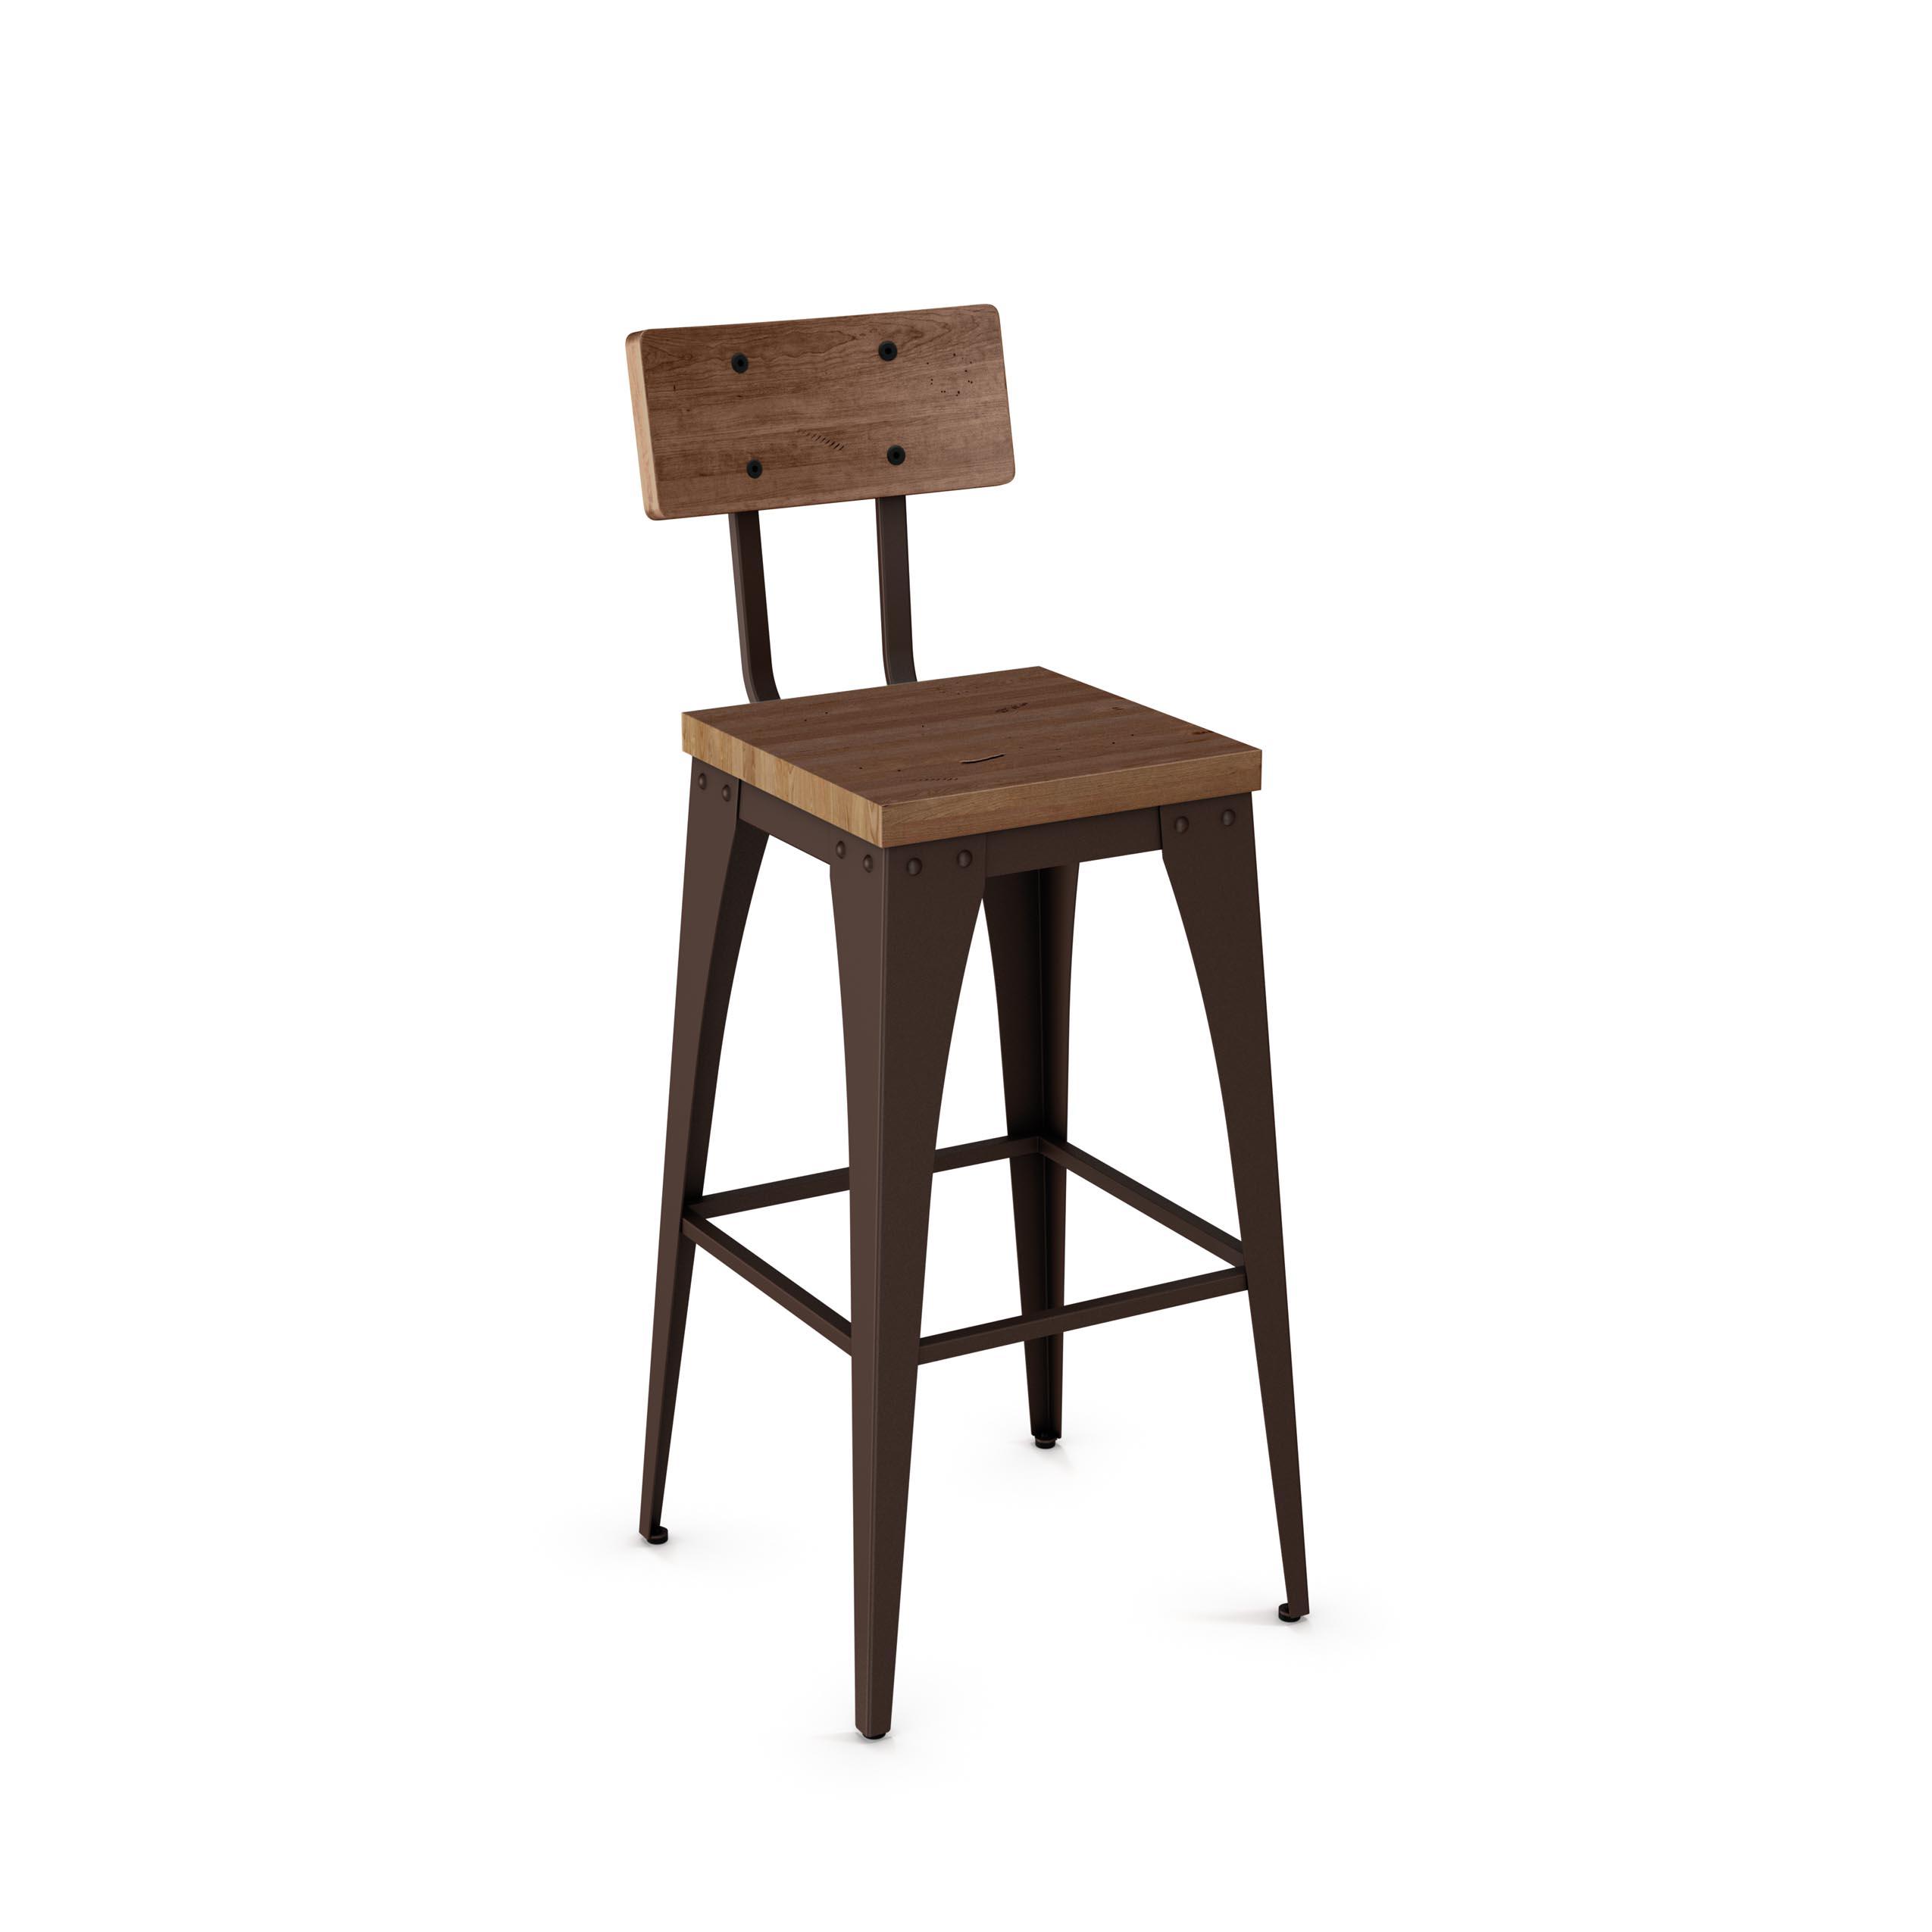 upright-stool-four